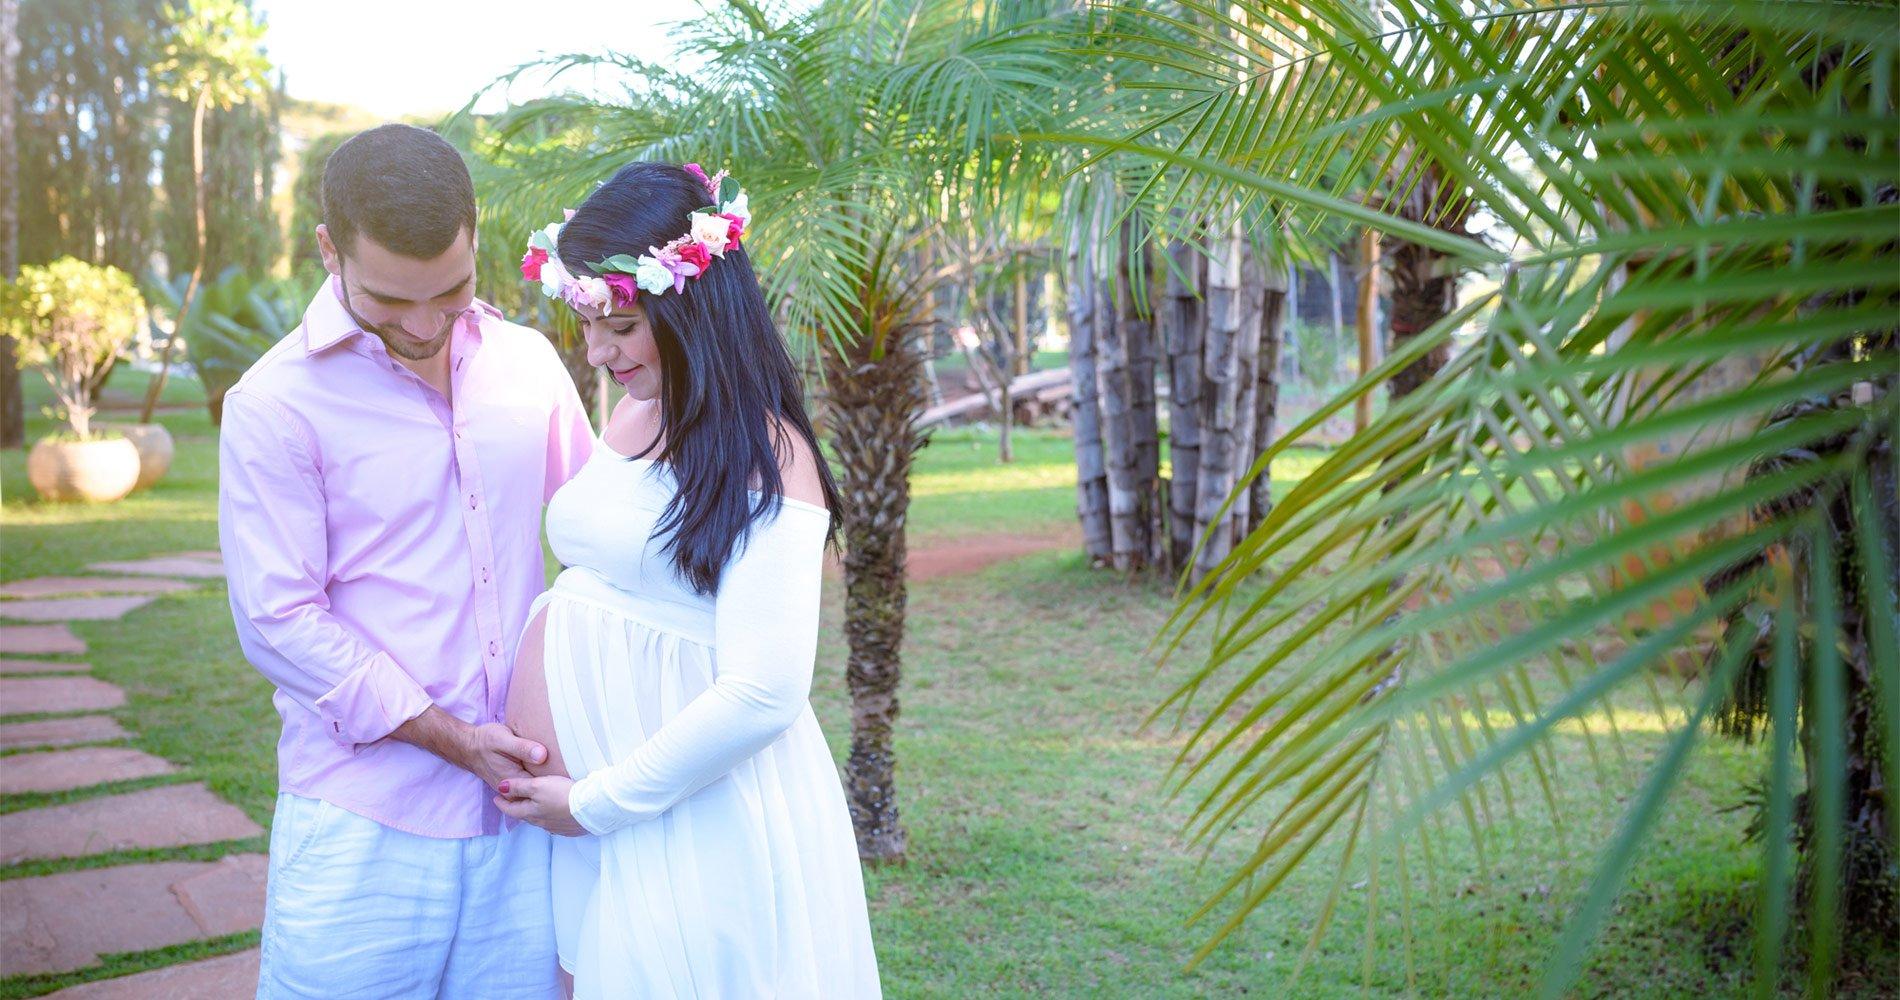 book de gestante em local arborizado de brasilia, casal